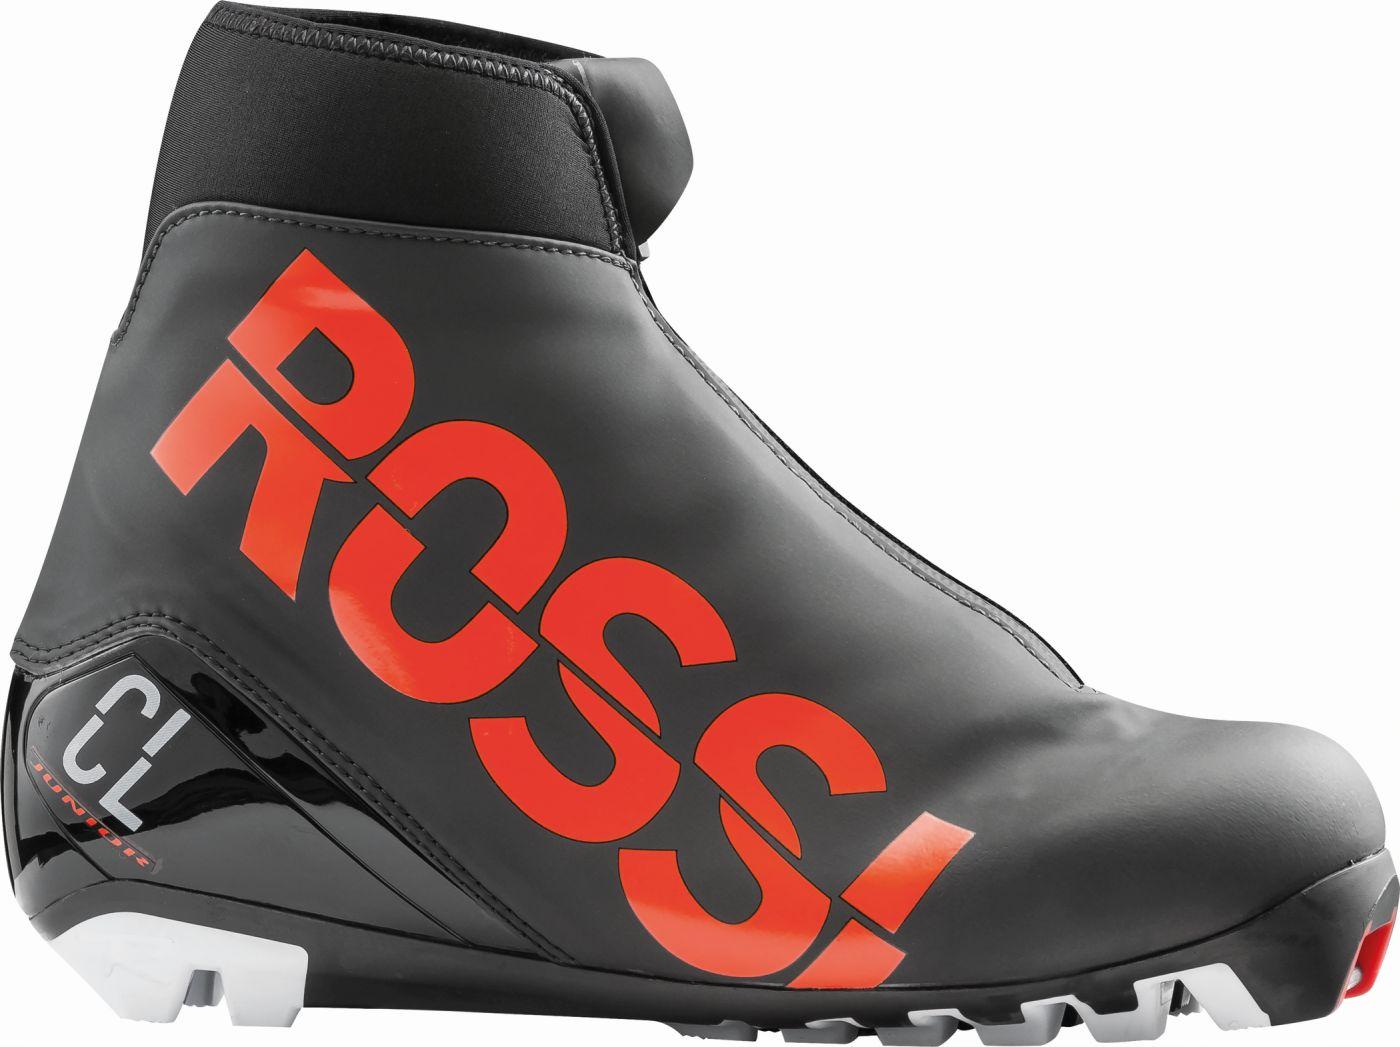 fe9470ffa1c66 Rossignol eshop - Bežecká obuv: X-IUM J Classic